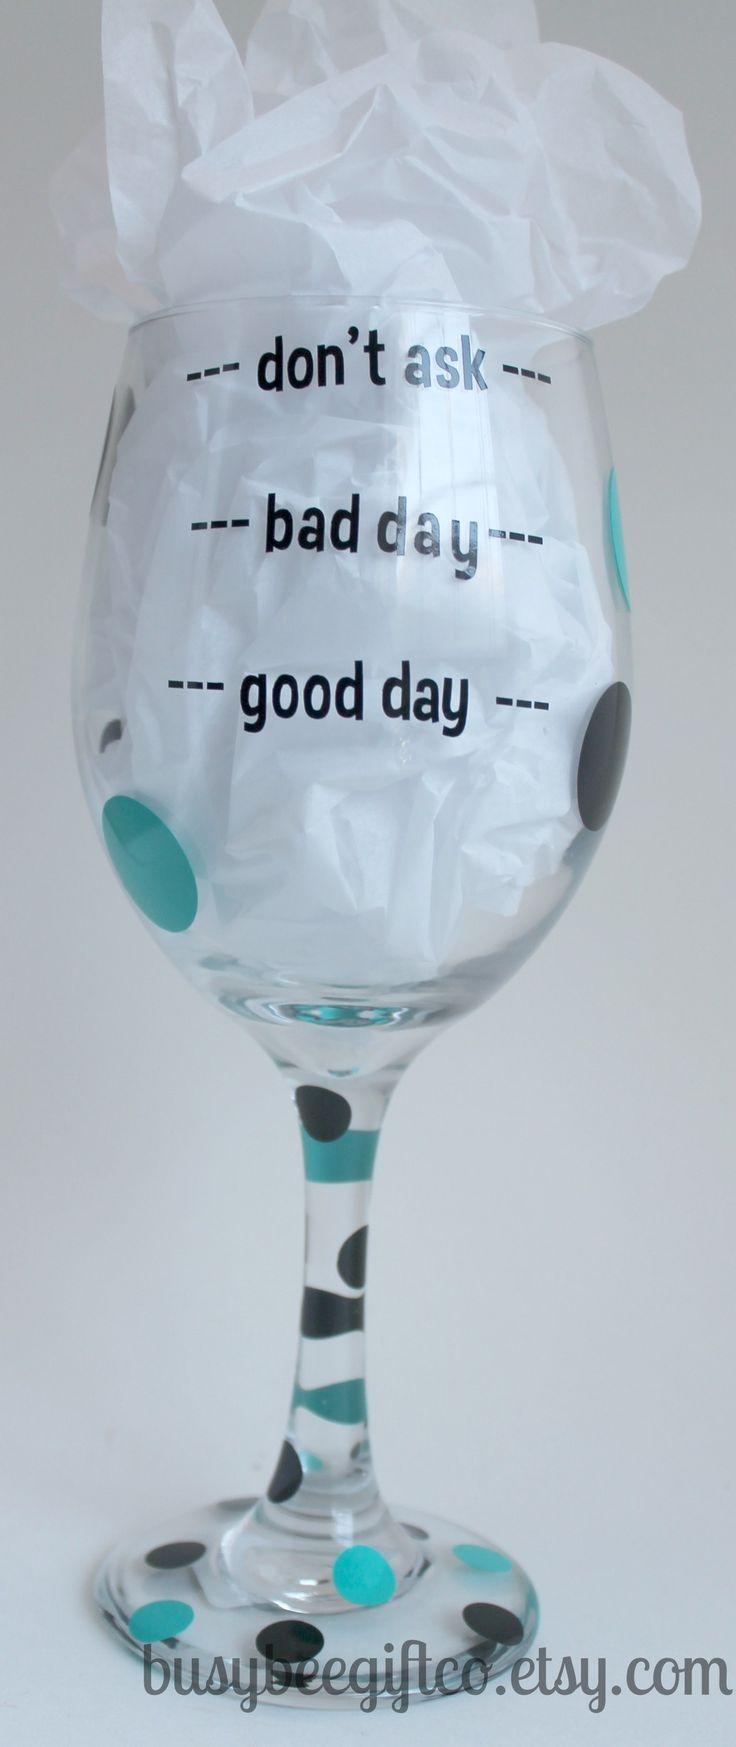 Good Day, Bay Day, Dont Ask 20 oz Wine Glass - $10.00 - Handmade Crafts by Mi Bella Vinyl